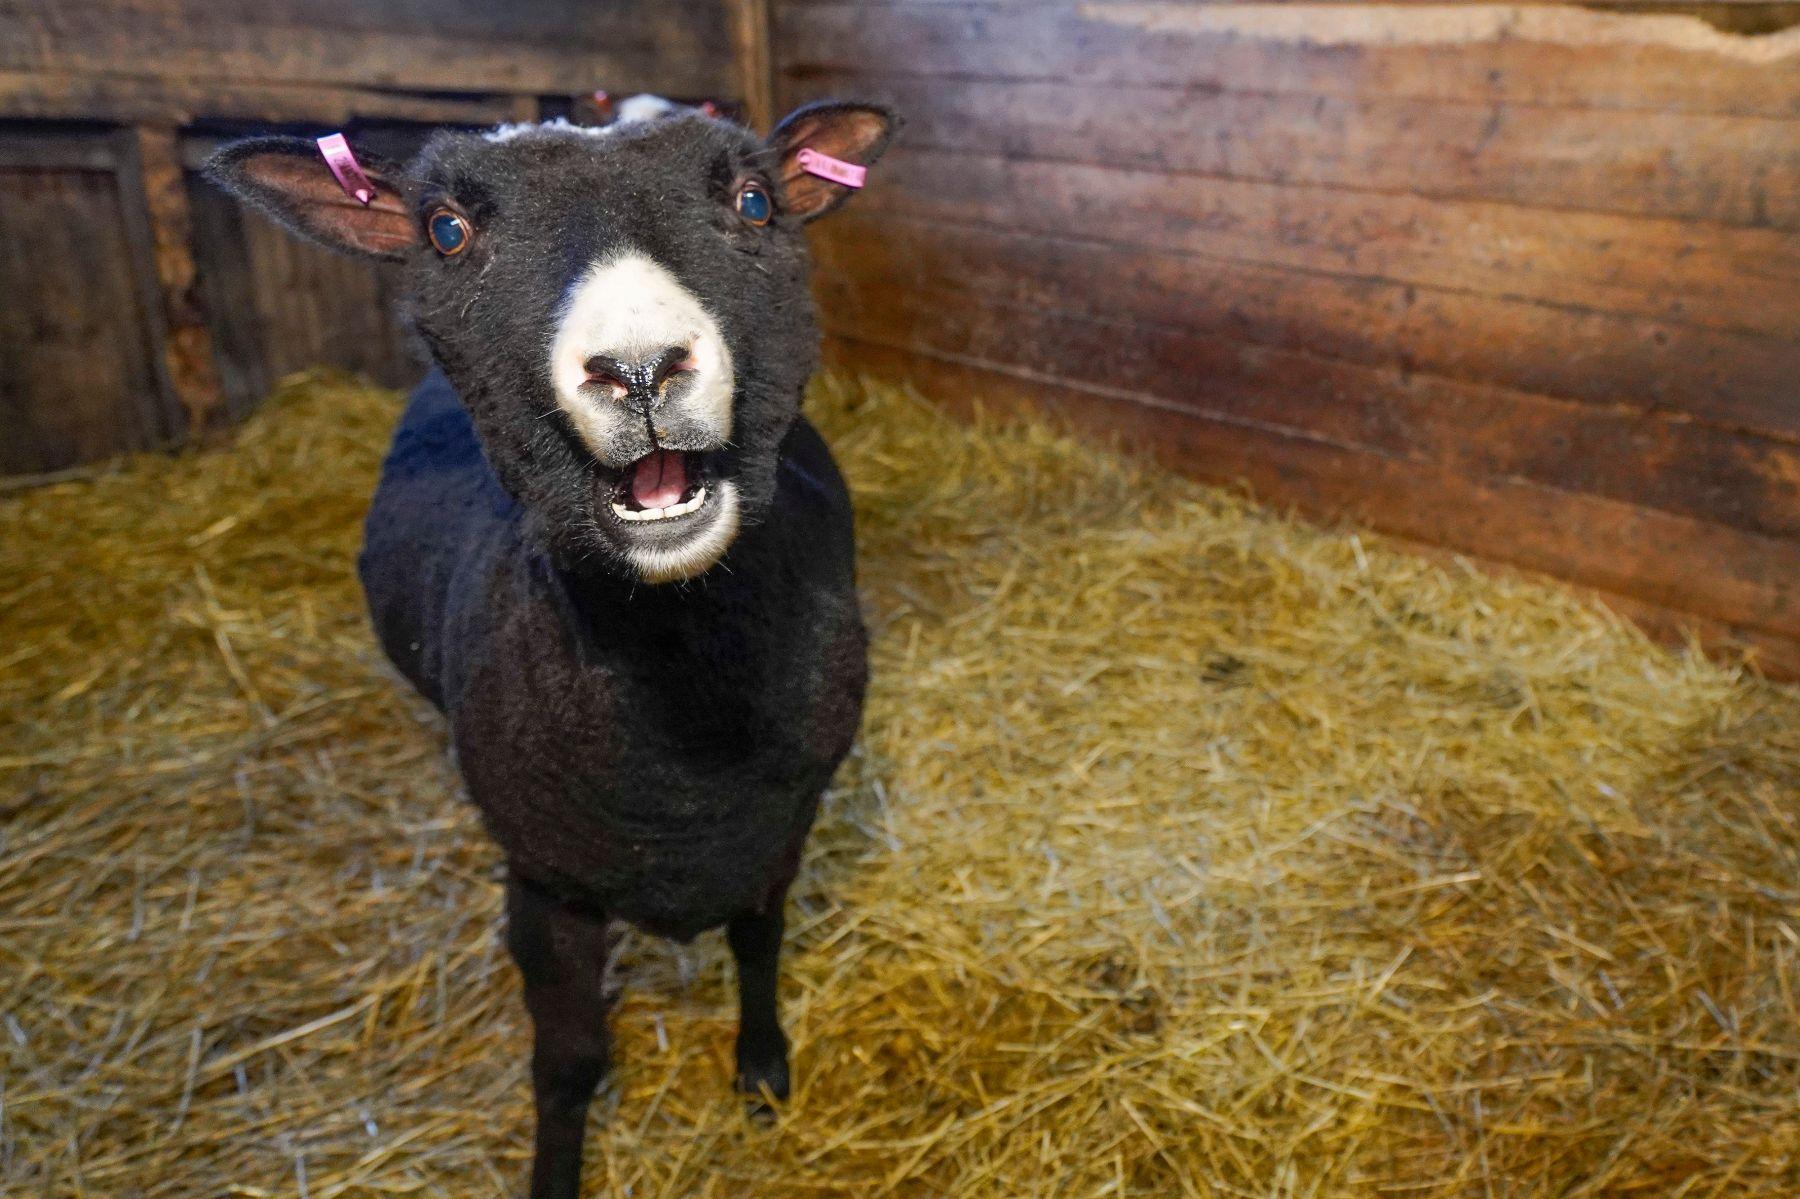 Lammas katsoo uteliaana suoraan kameraan